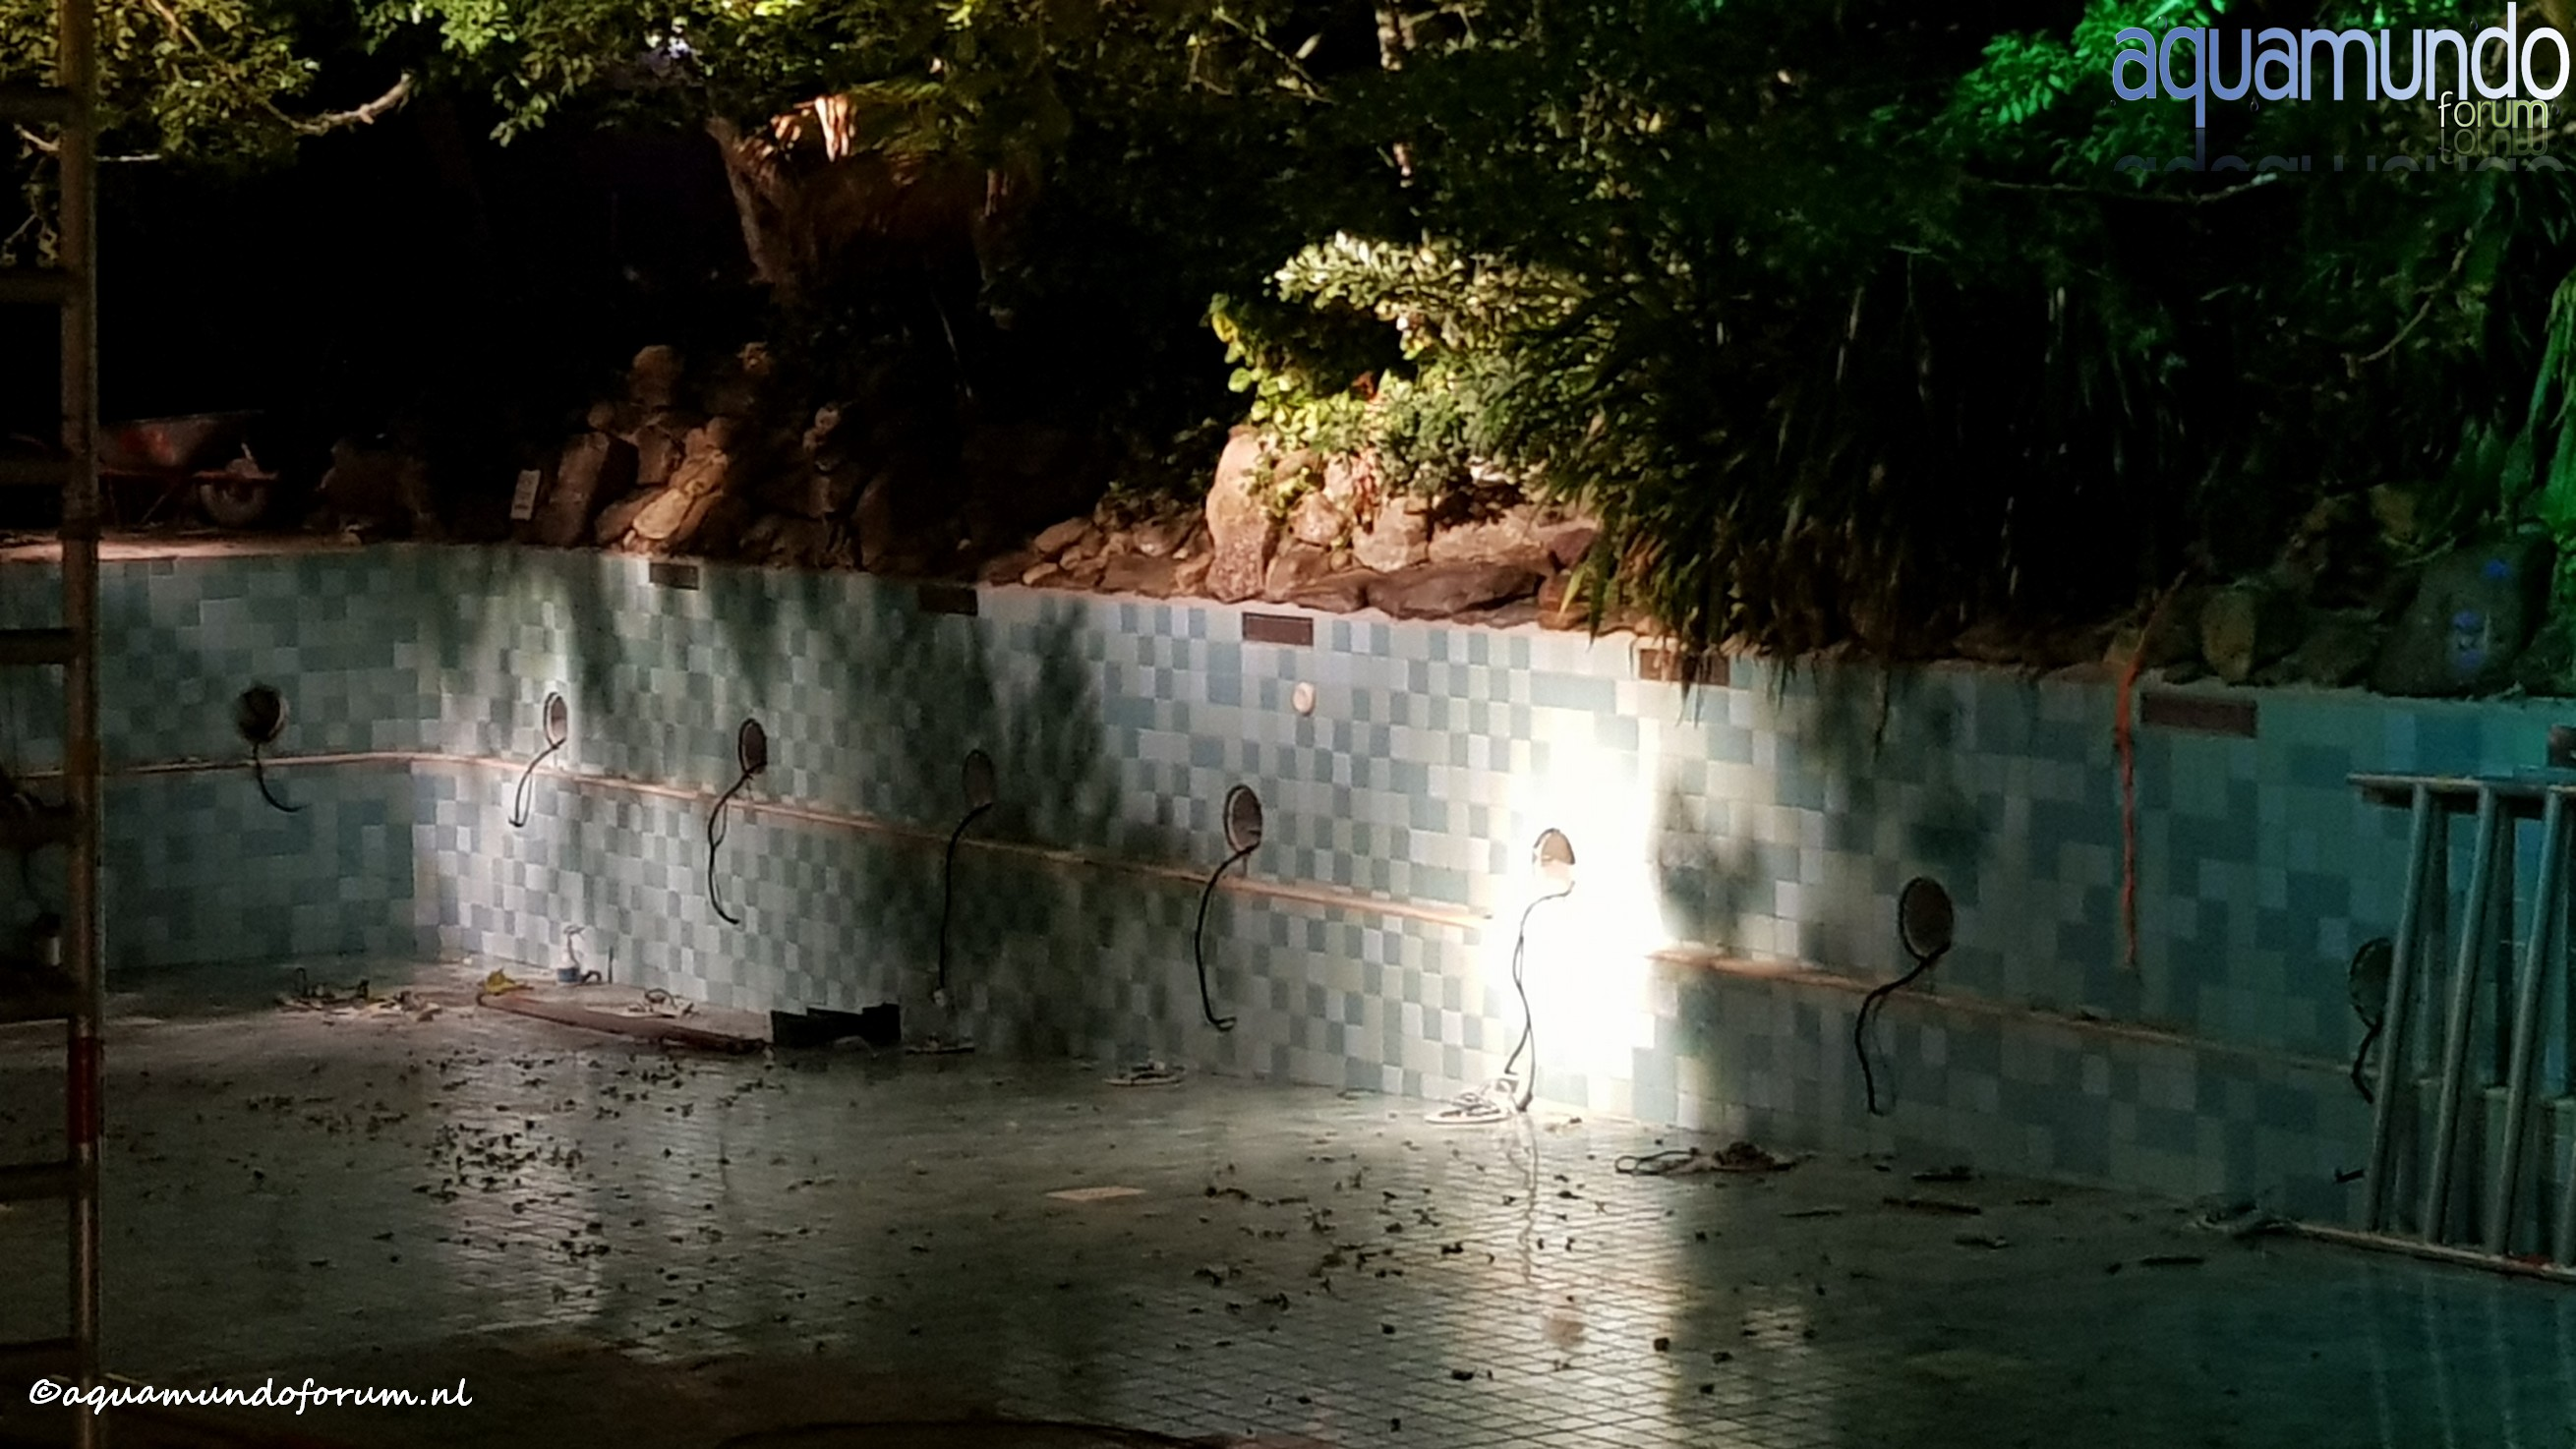 Onderhoud 25 meterbad Aqua Mundo Center Parcs De Huttenheugte (3).jpg